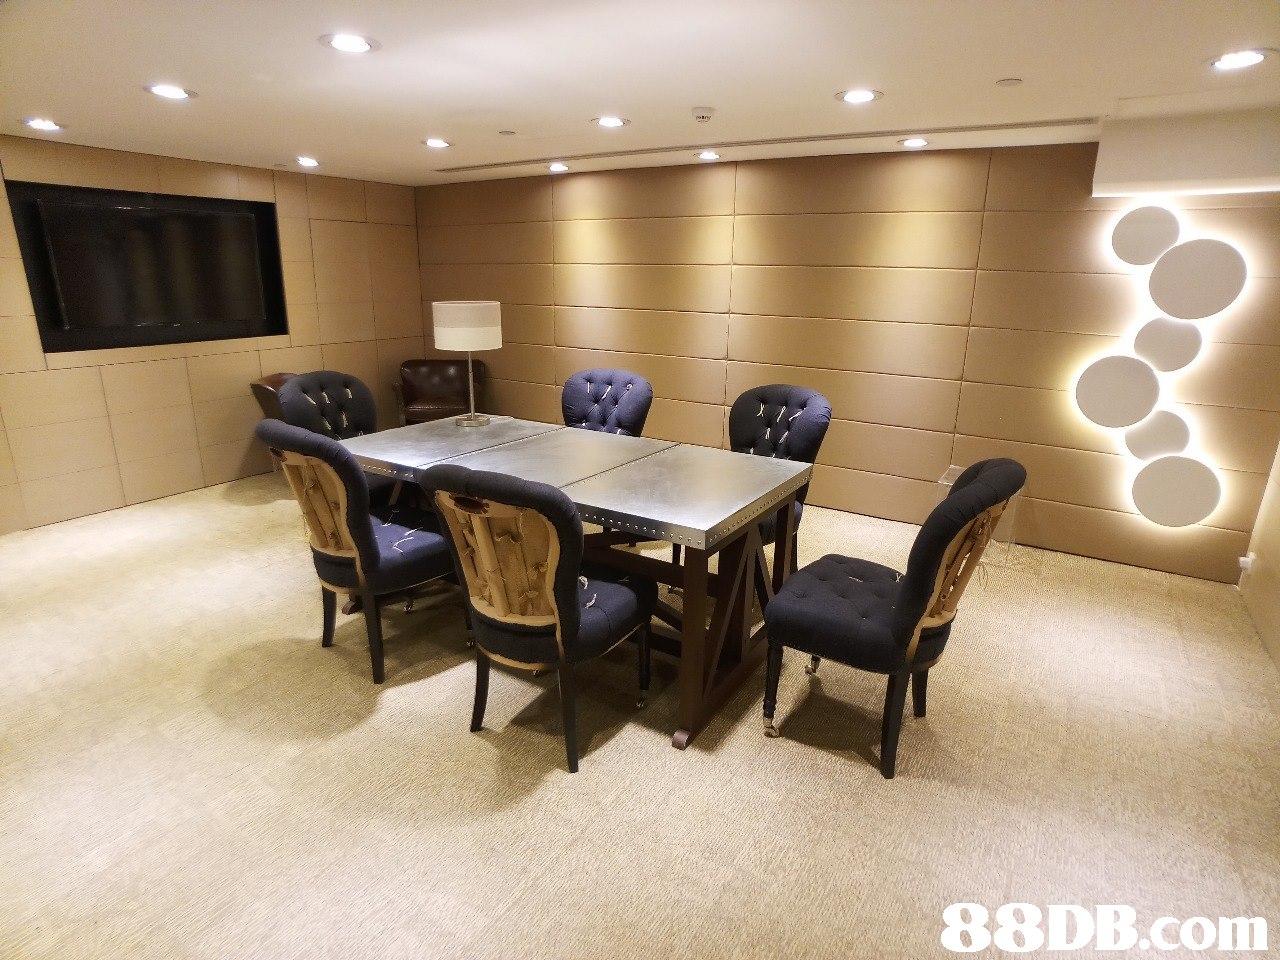 88DB.com  property